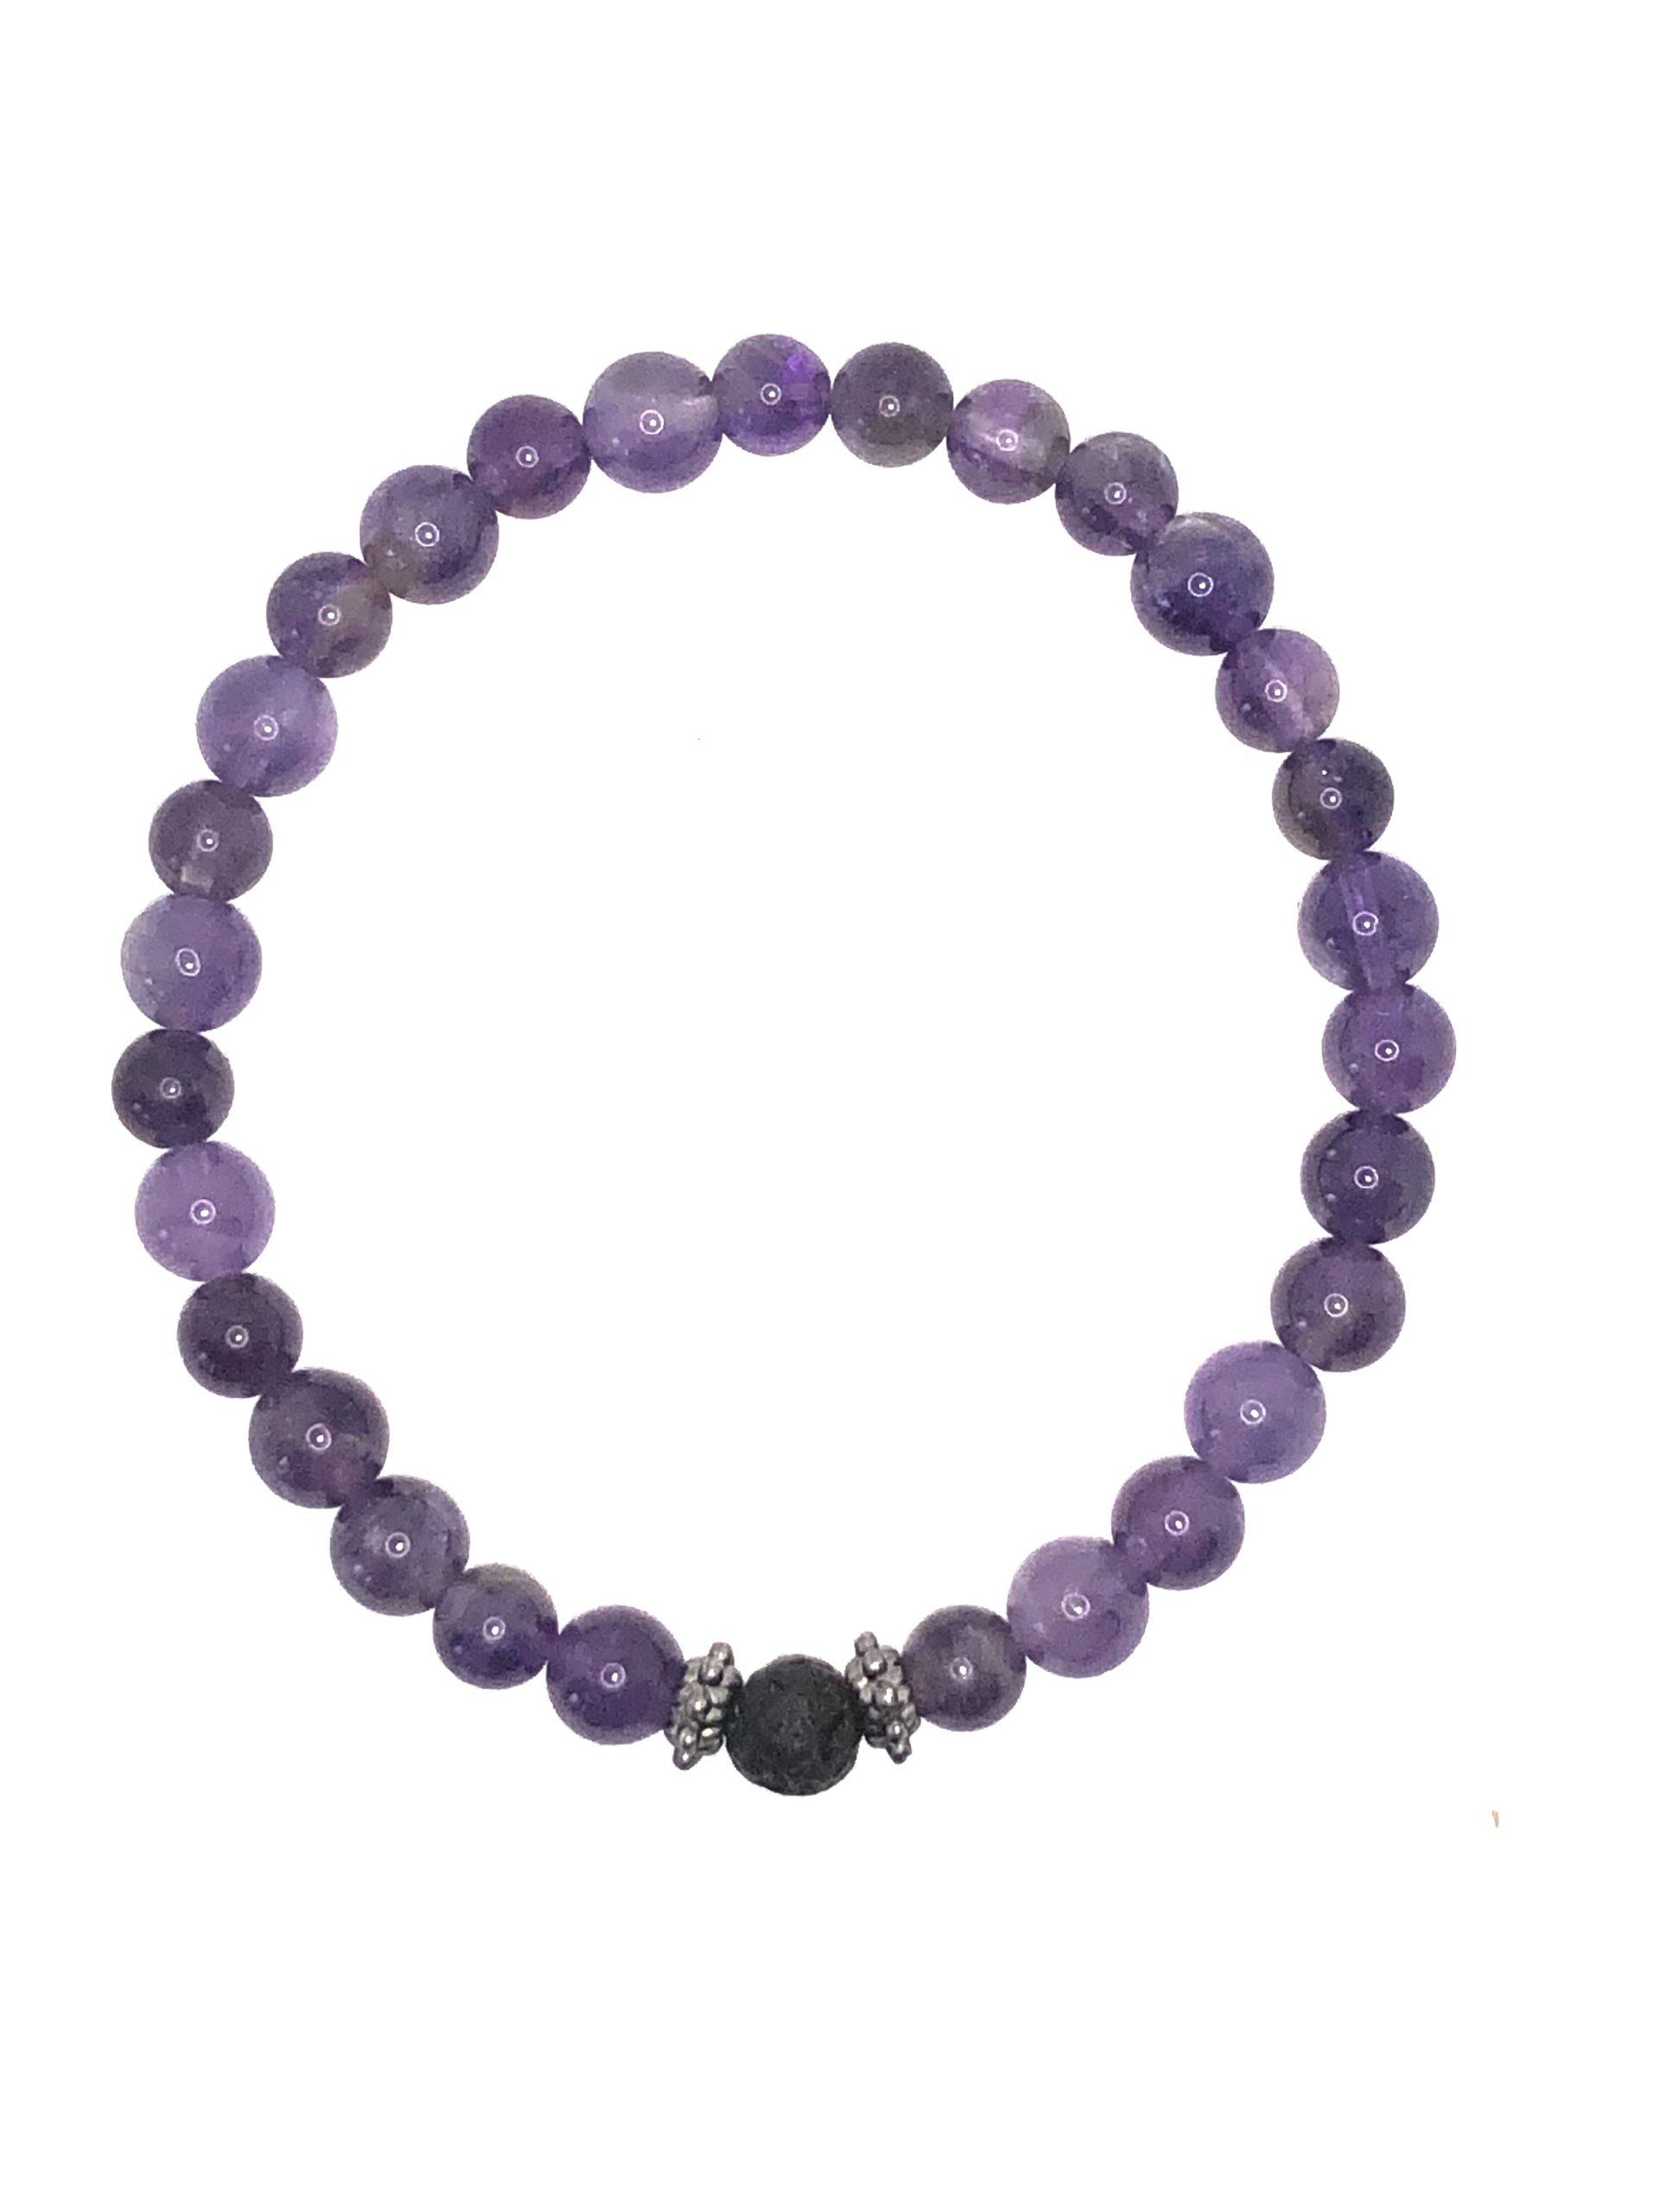 Amethyst Quartz Bracelet for sale online